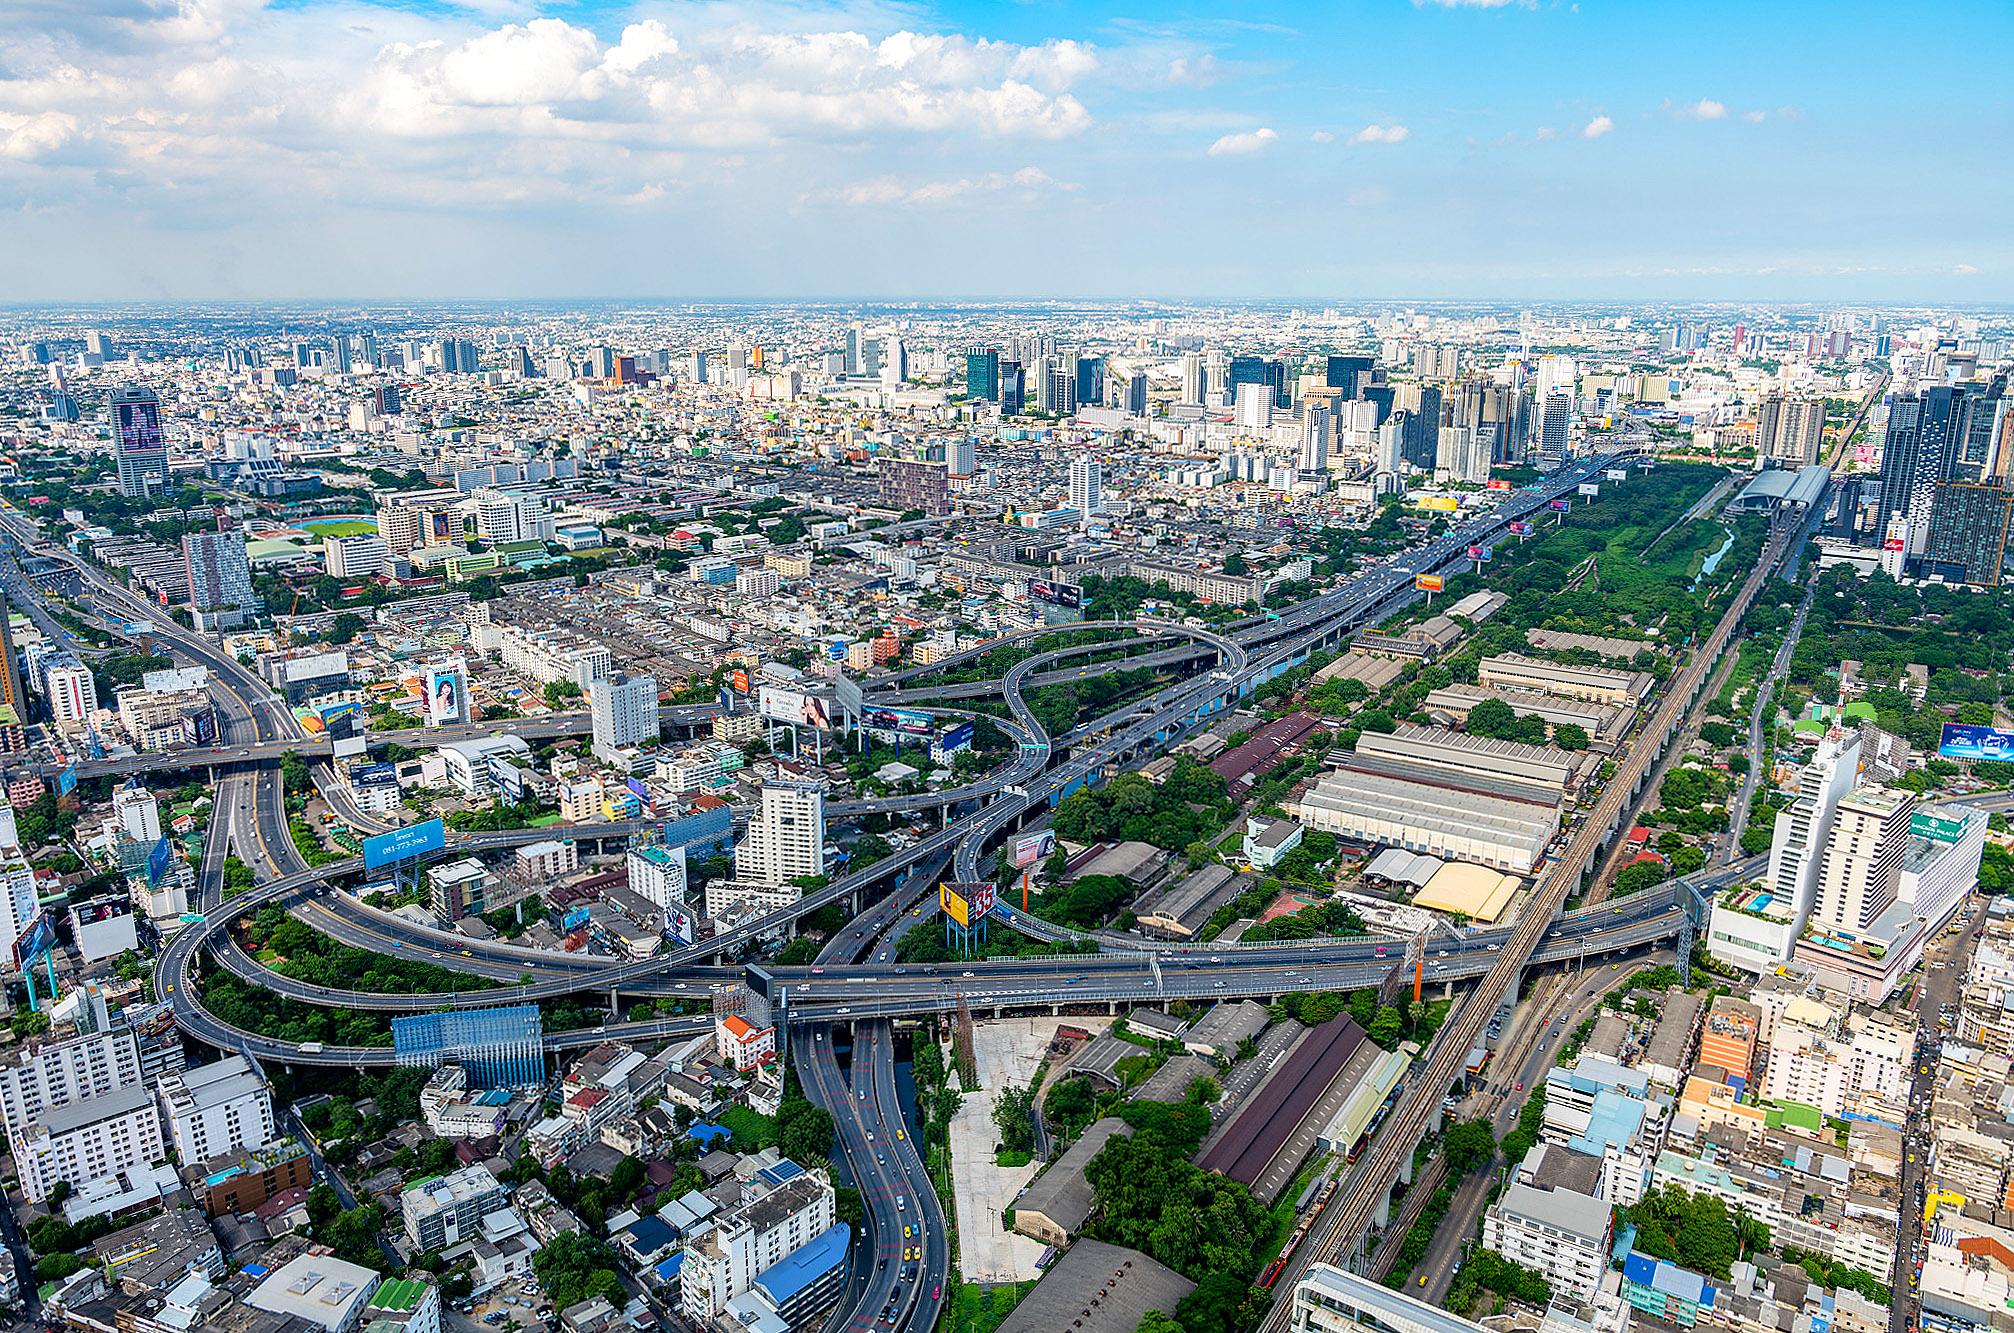 Bangkok Junction by Tenfas Apk.jpg